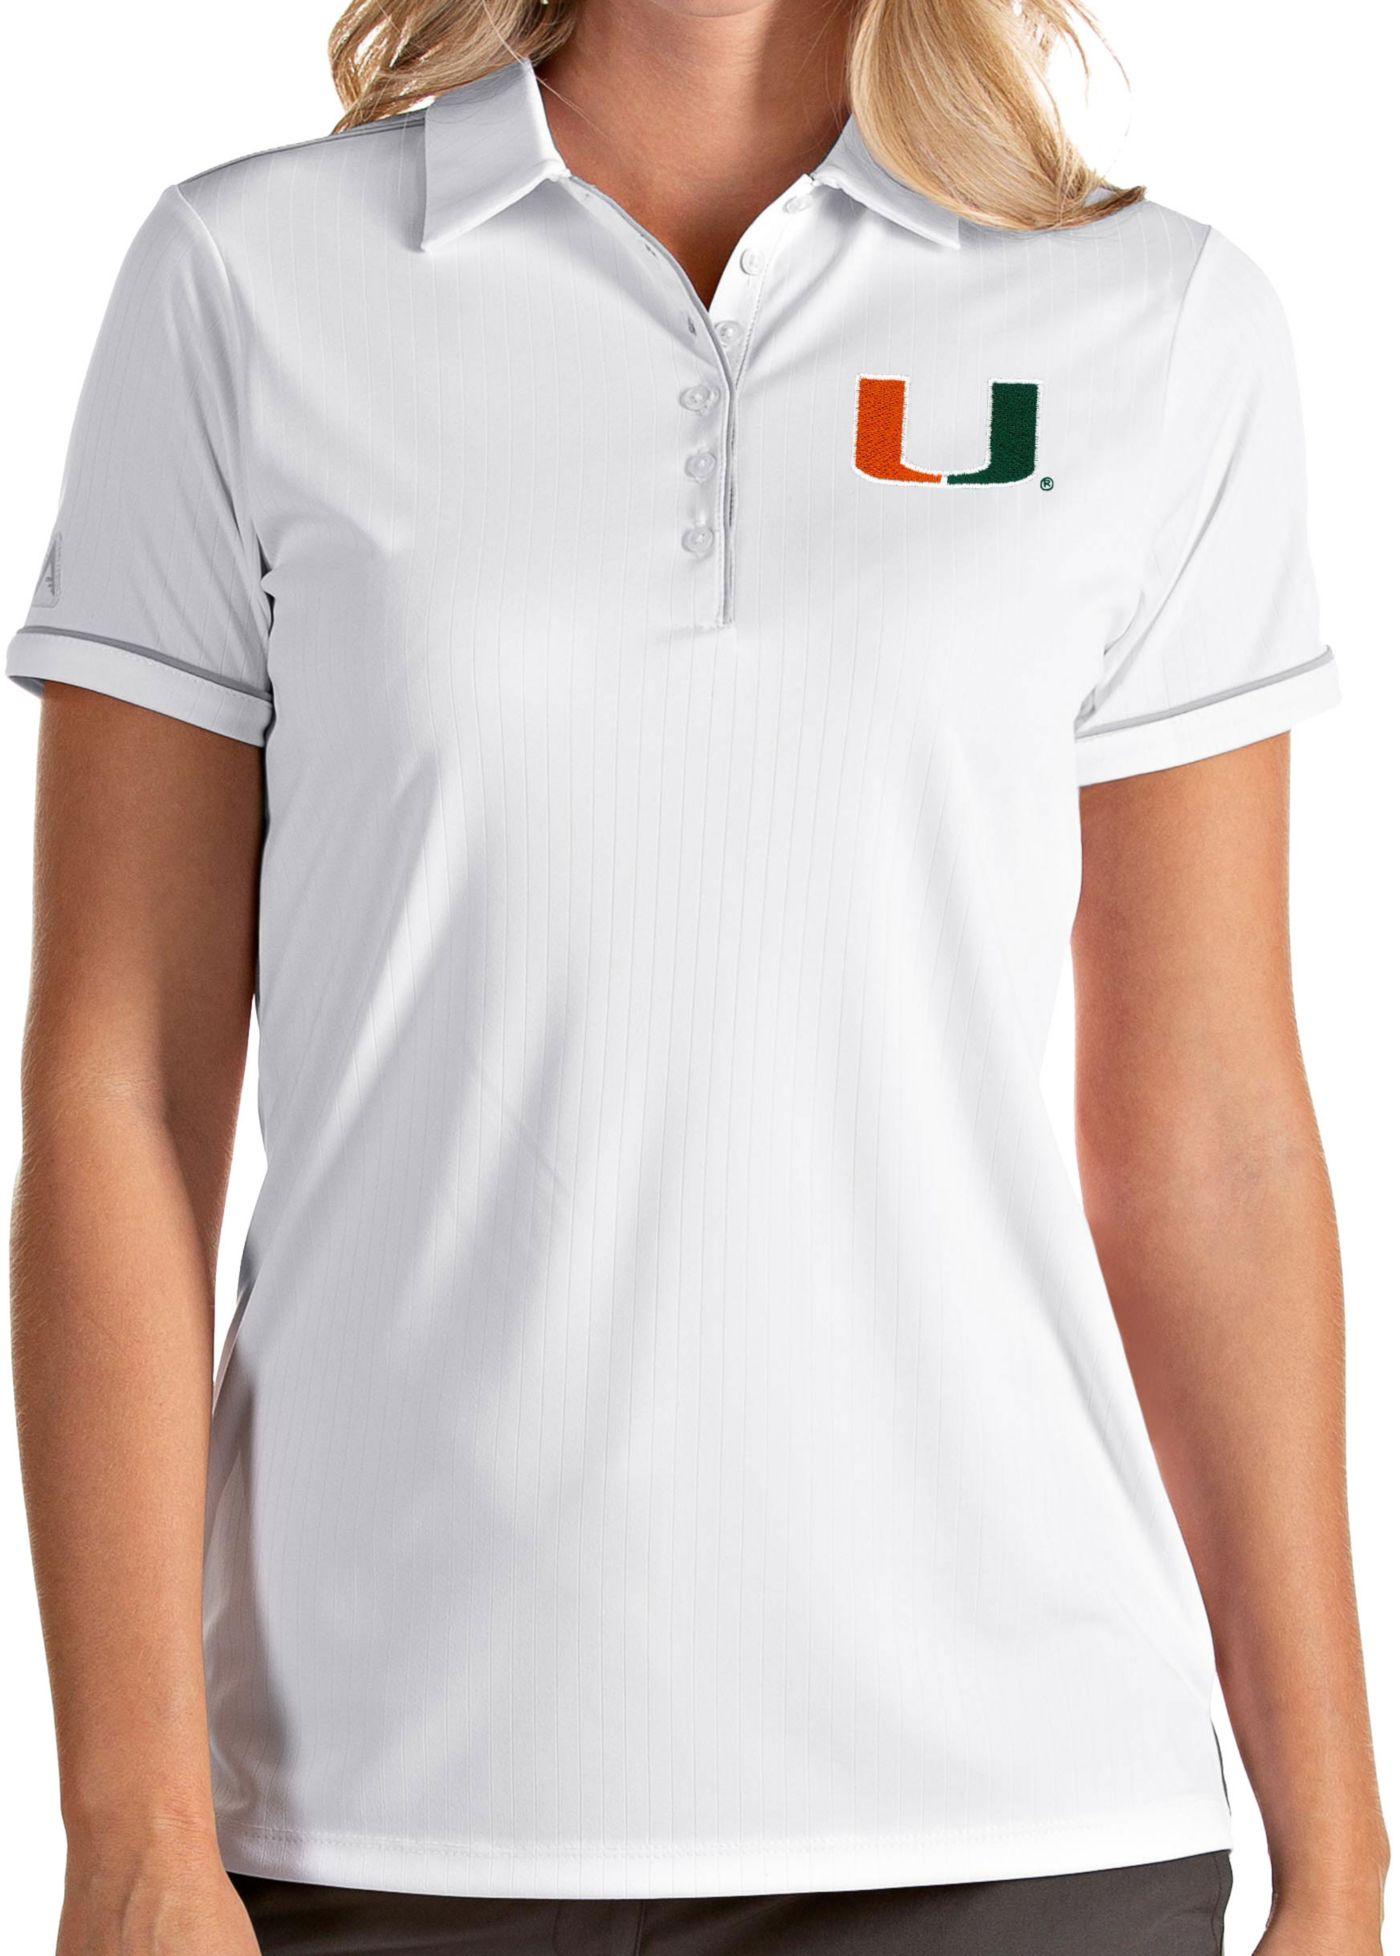 Antigua Women's Miami Hurricanes Salute Performance White Polo